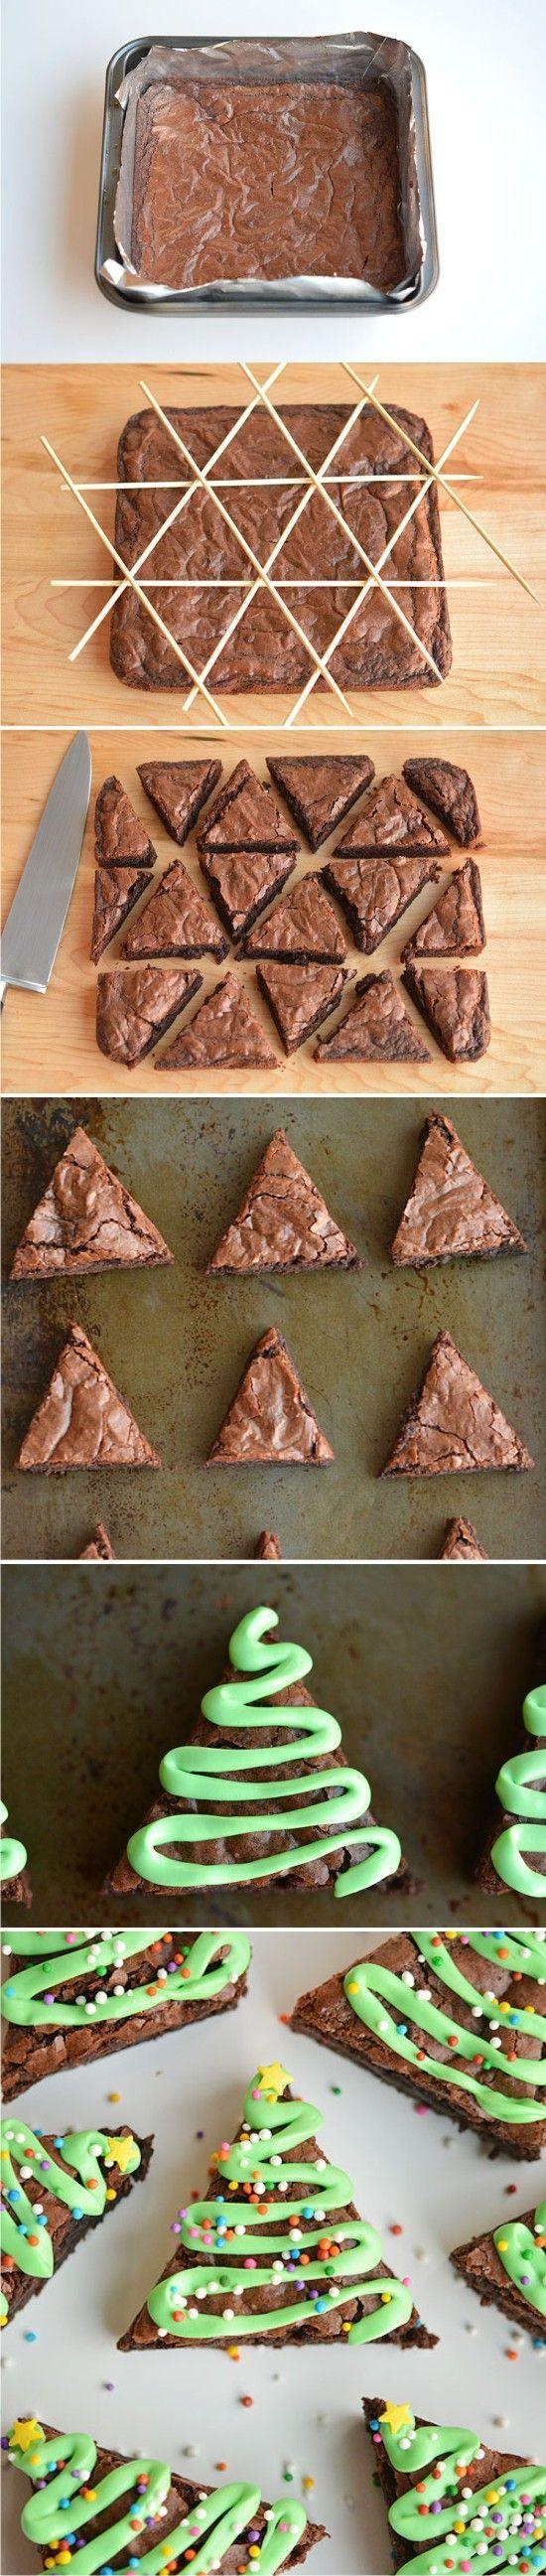 Easy Christmas Tree Brownies - brownies, chocolate, christmas, dessert, recipes